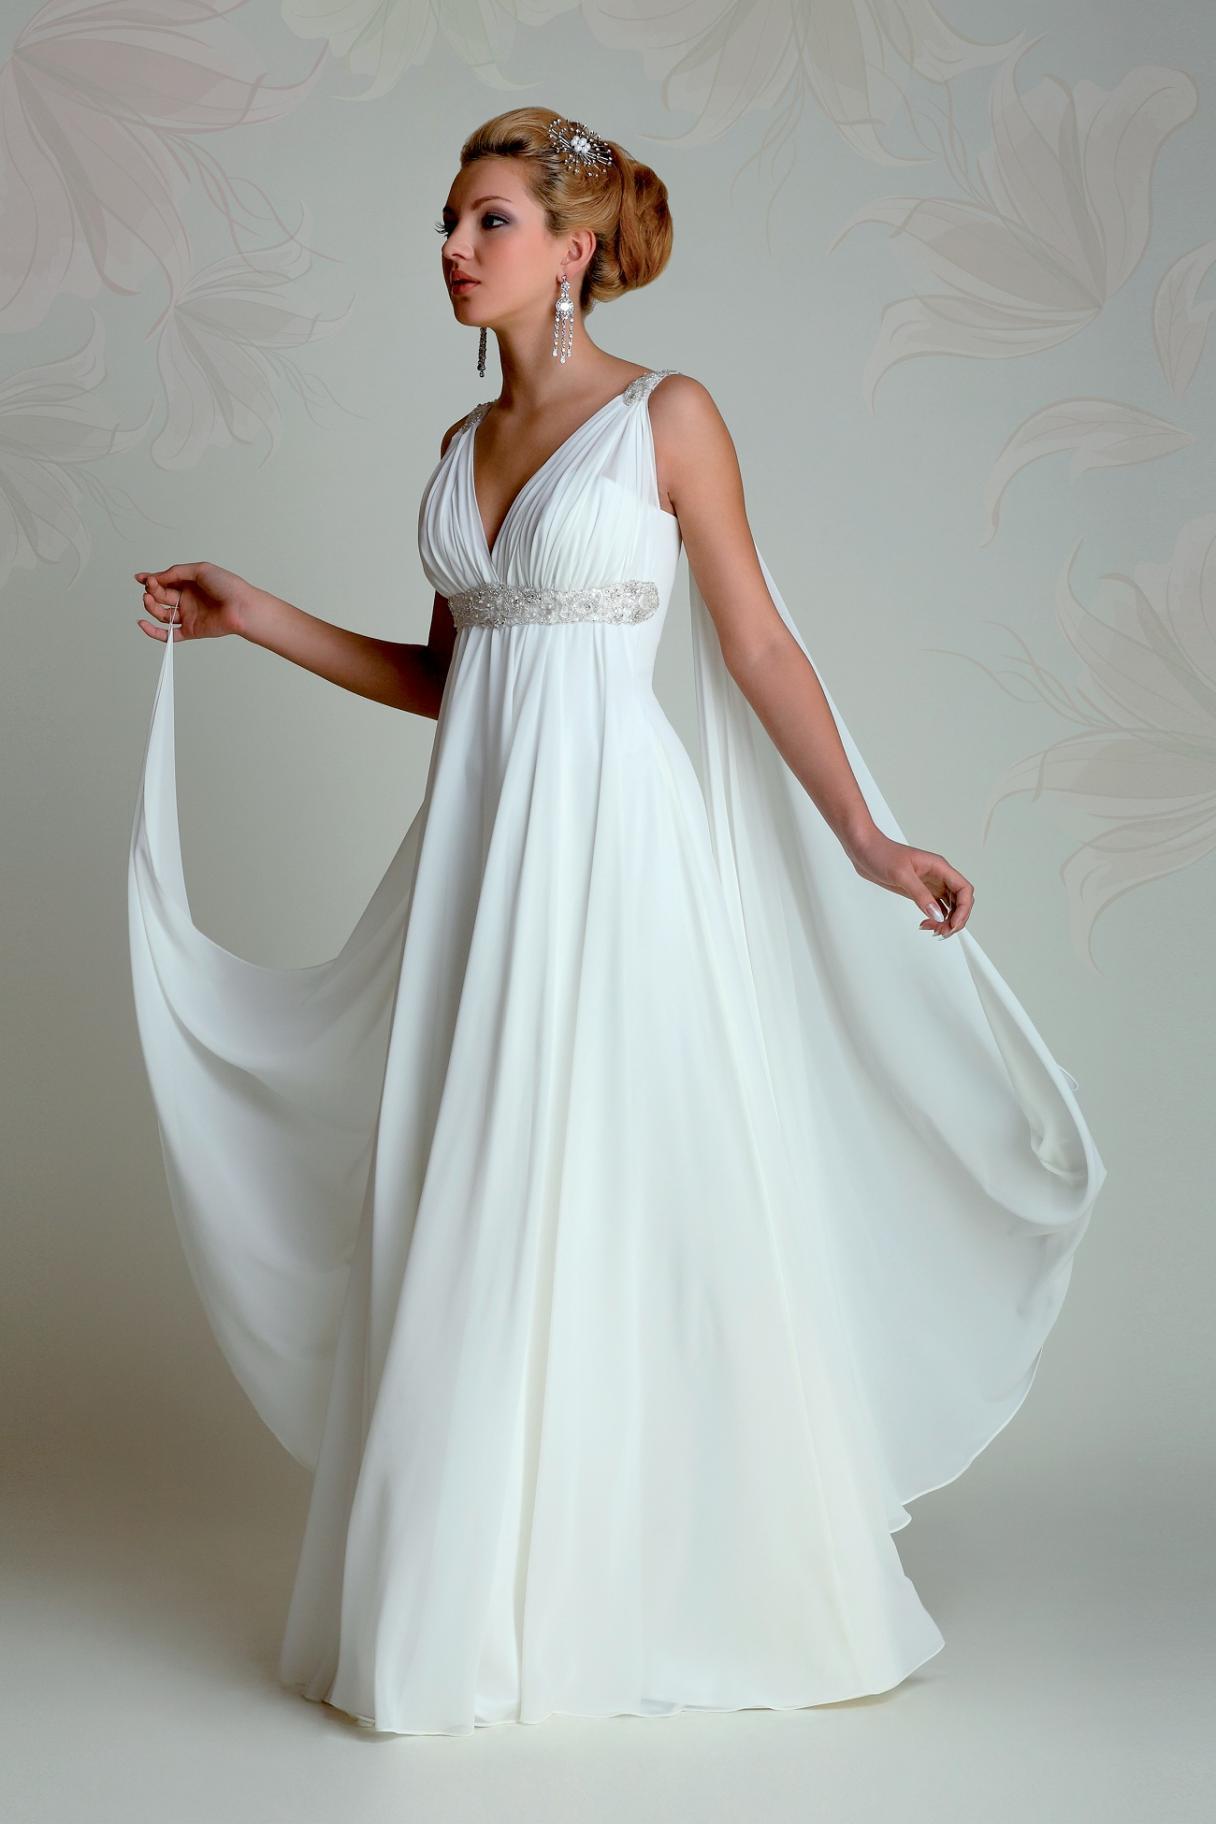 Vestido novia estilo diosa griega